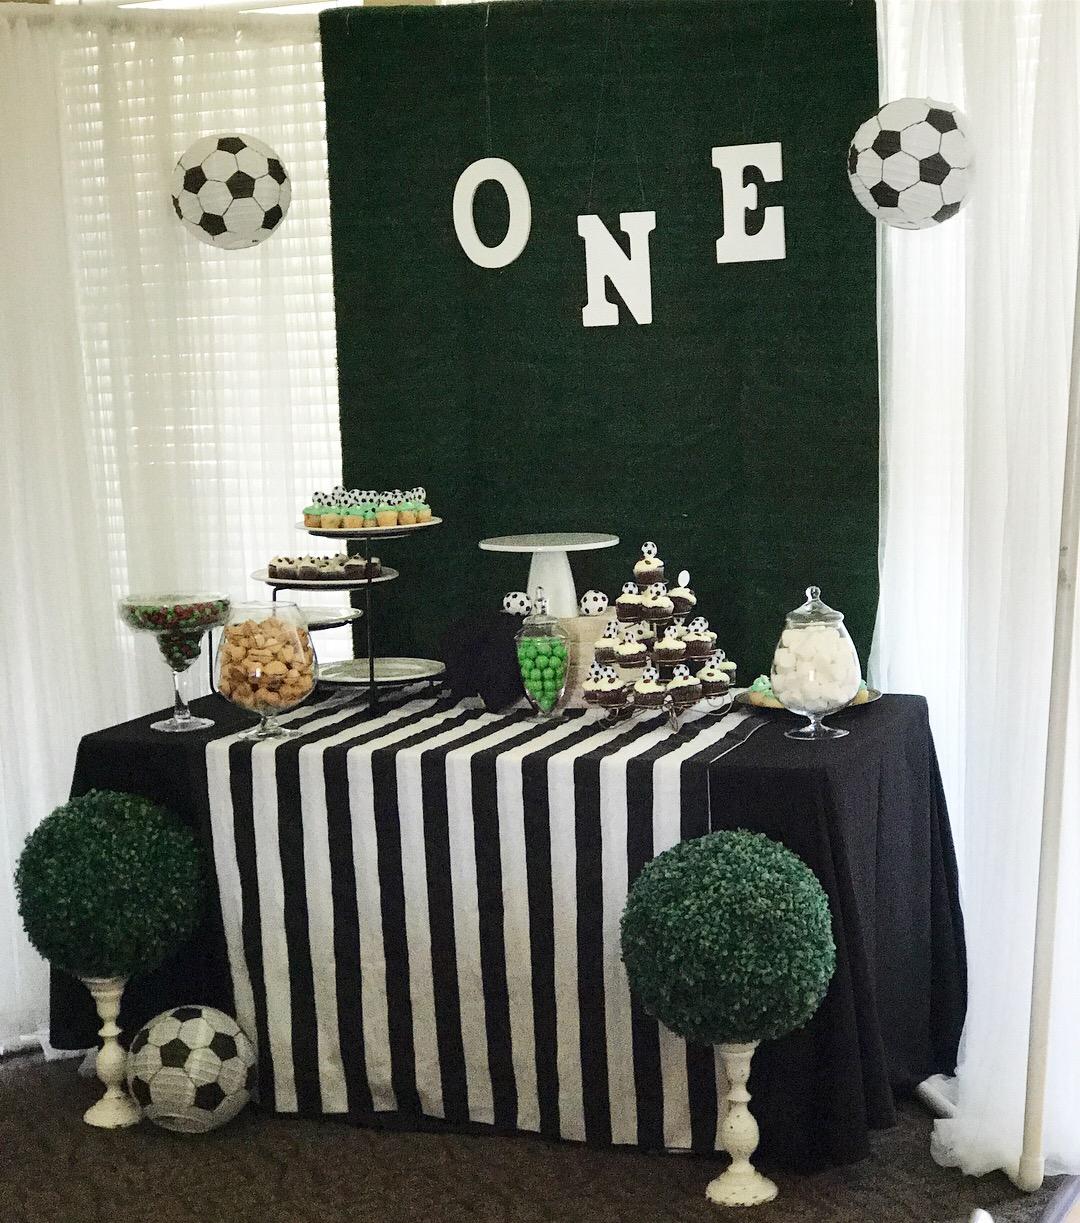 Soccer Themed Wedding Ideas: Themed Backdrop- Soccer